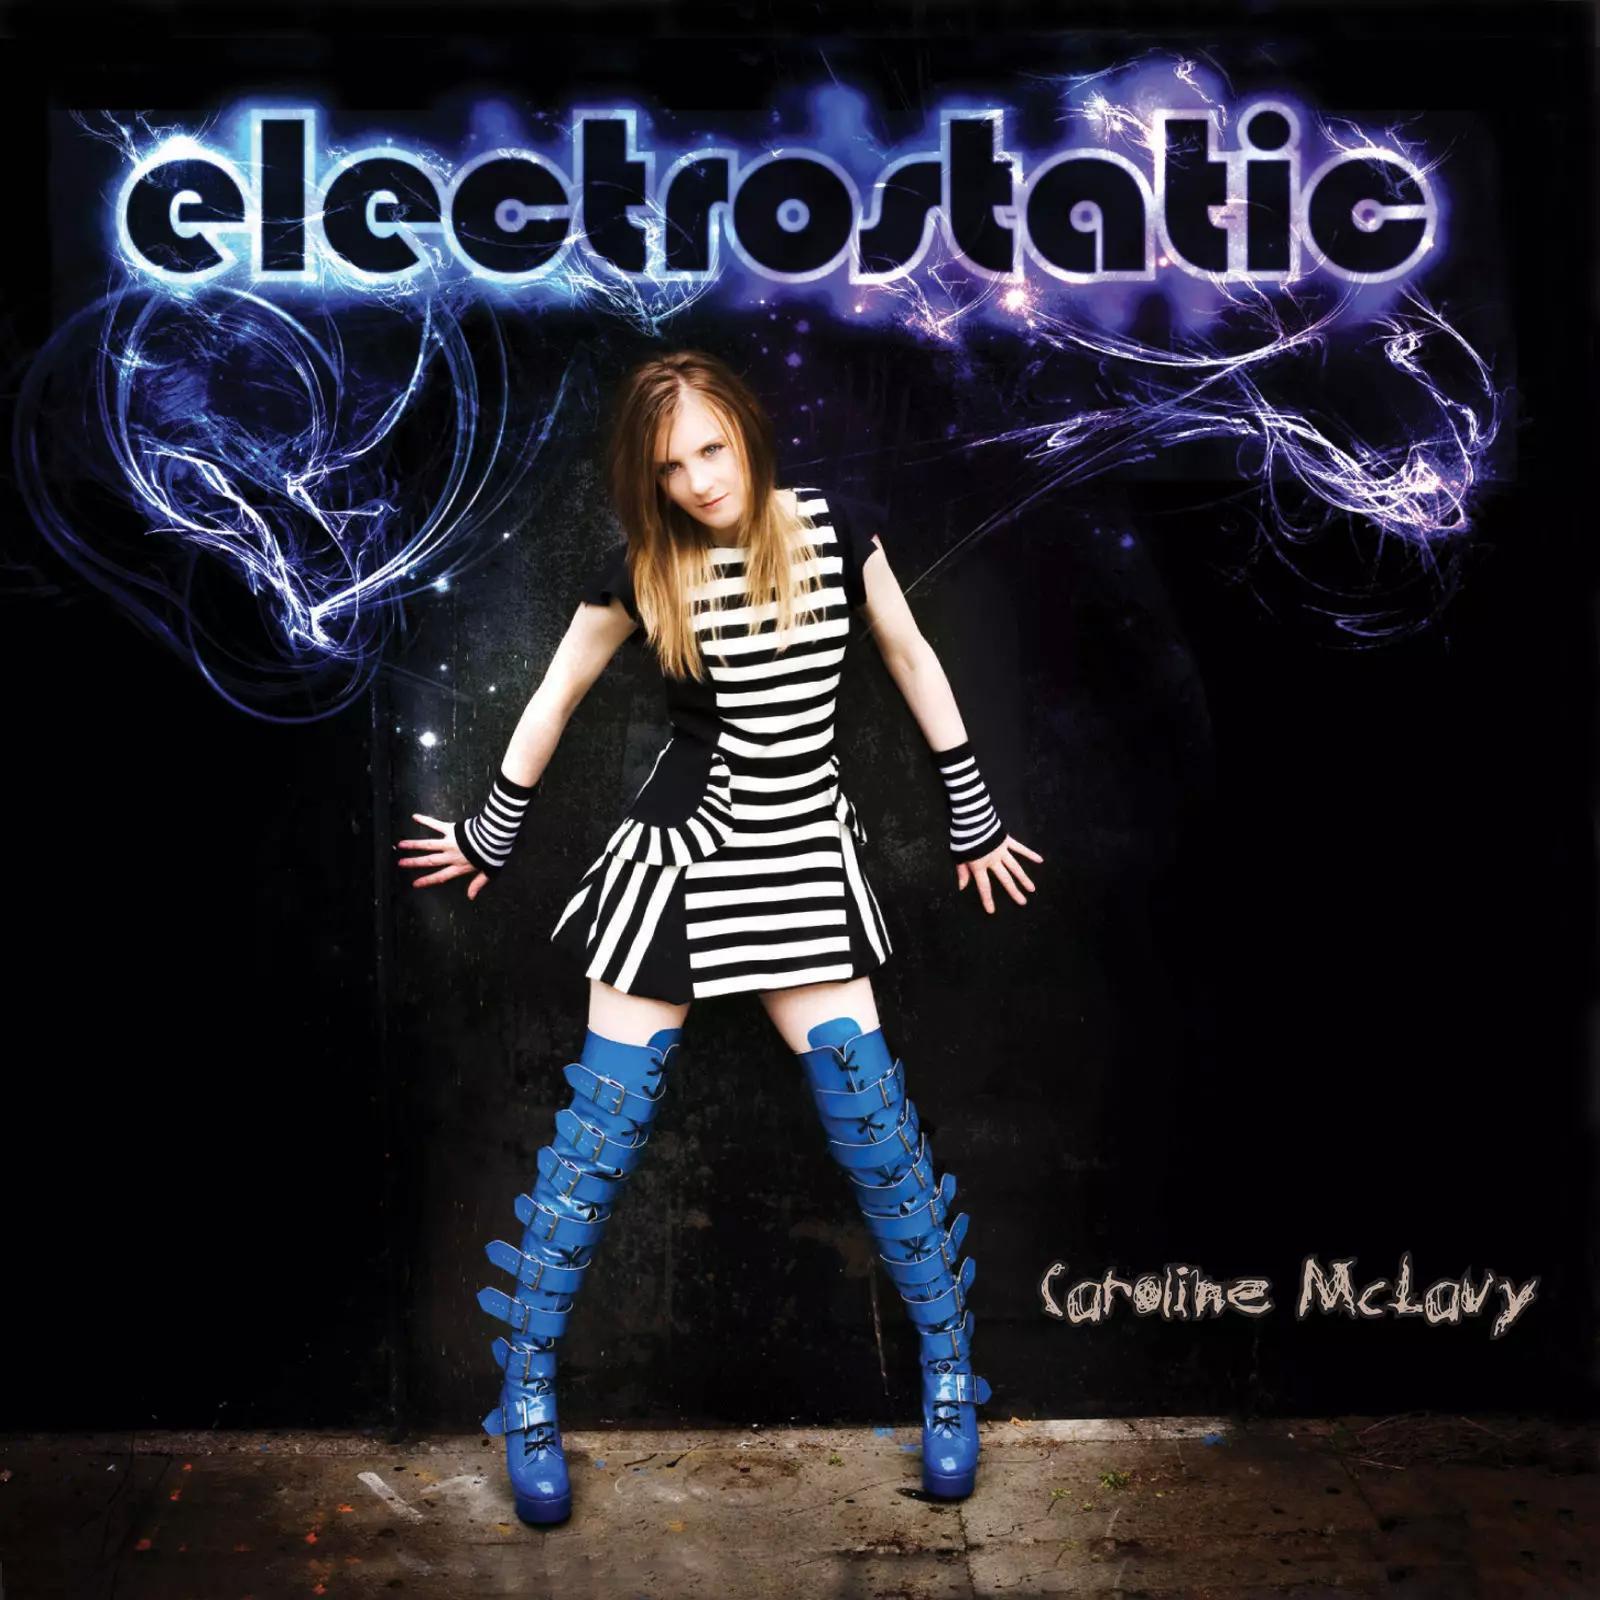 ElectrostaticCdArtwork